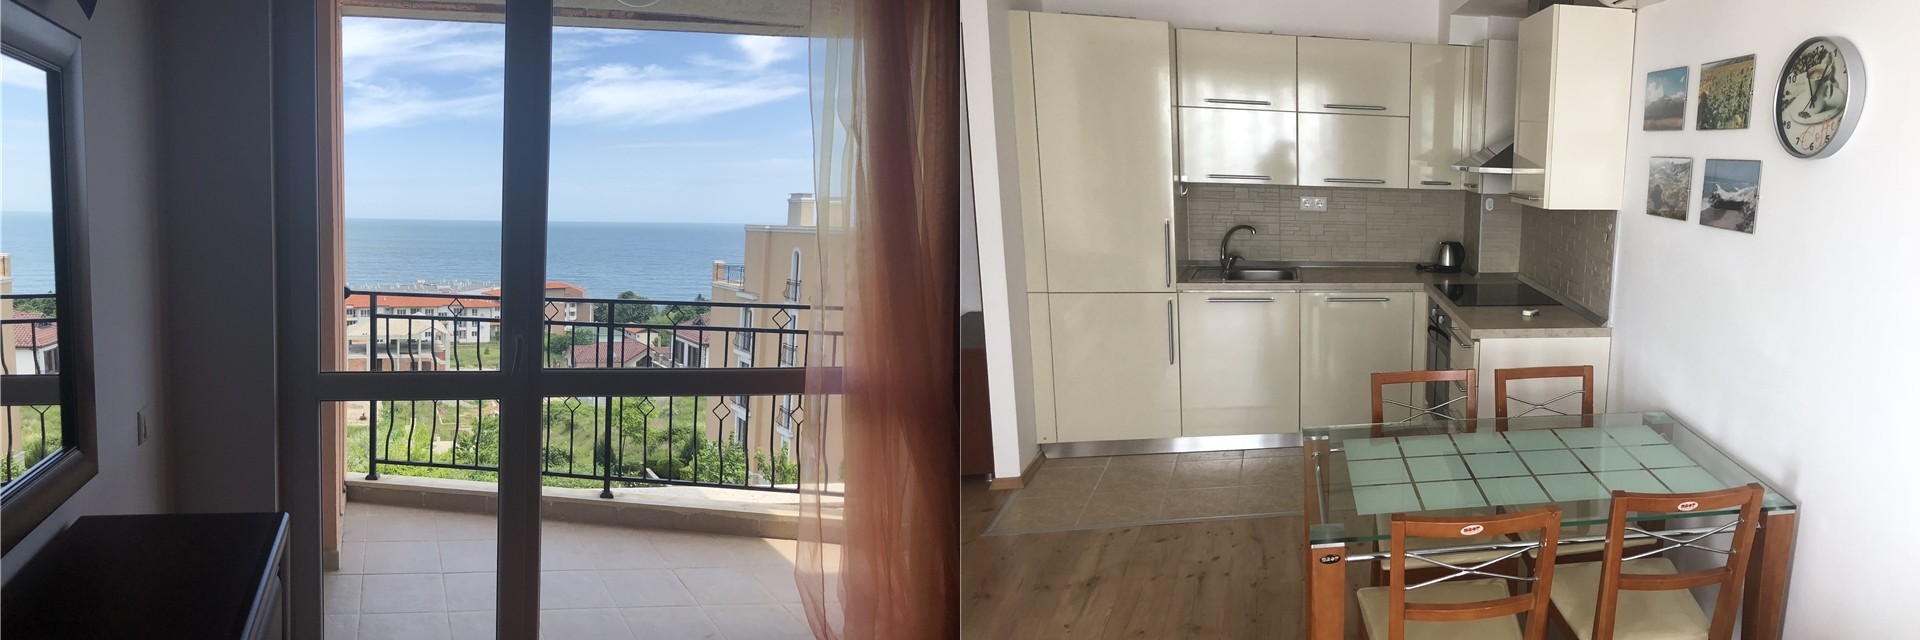 Апартамент с панорамой моря